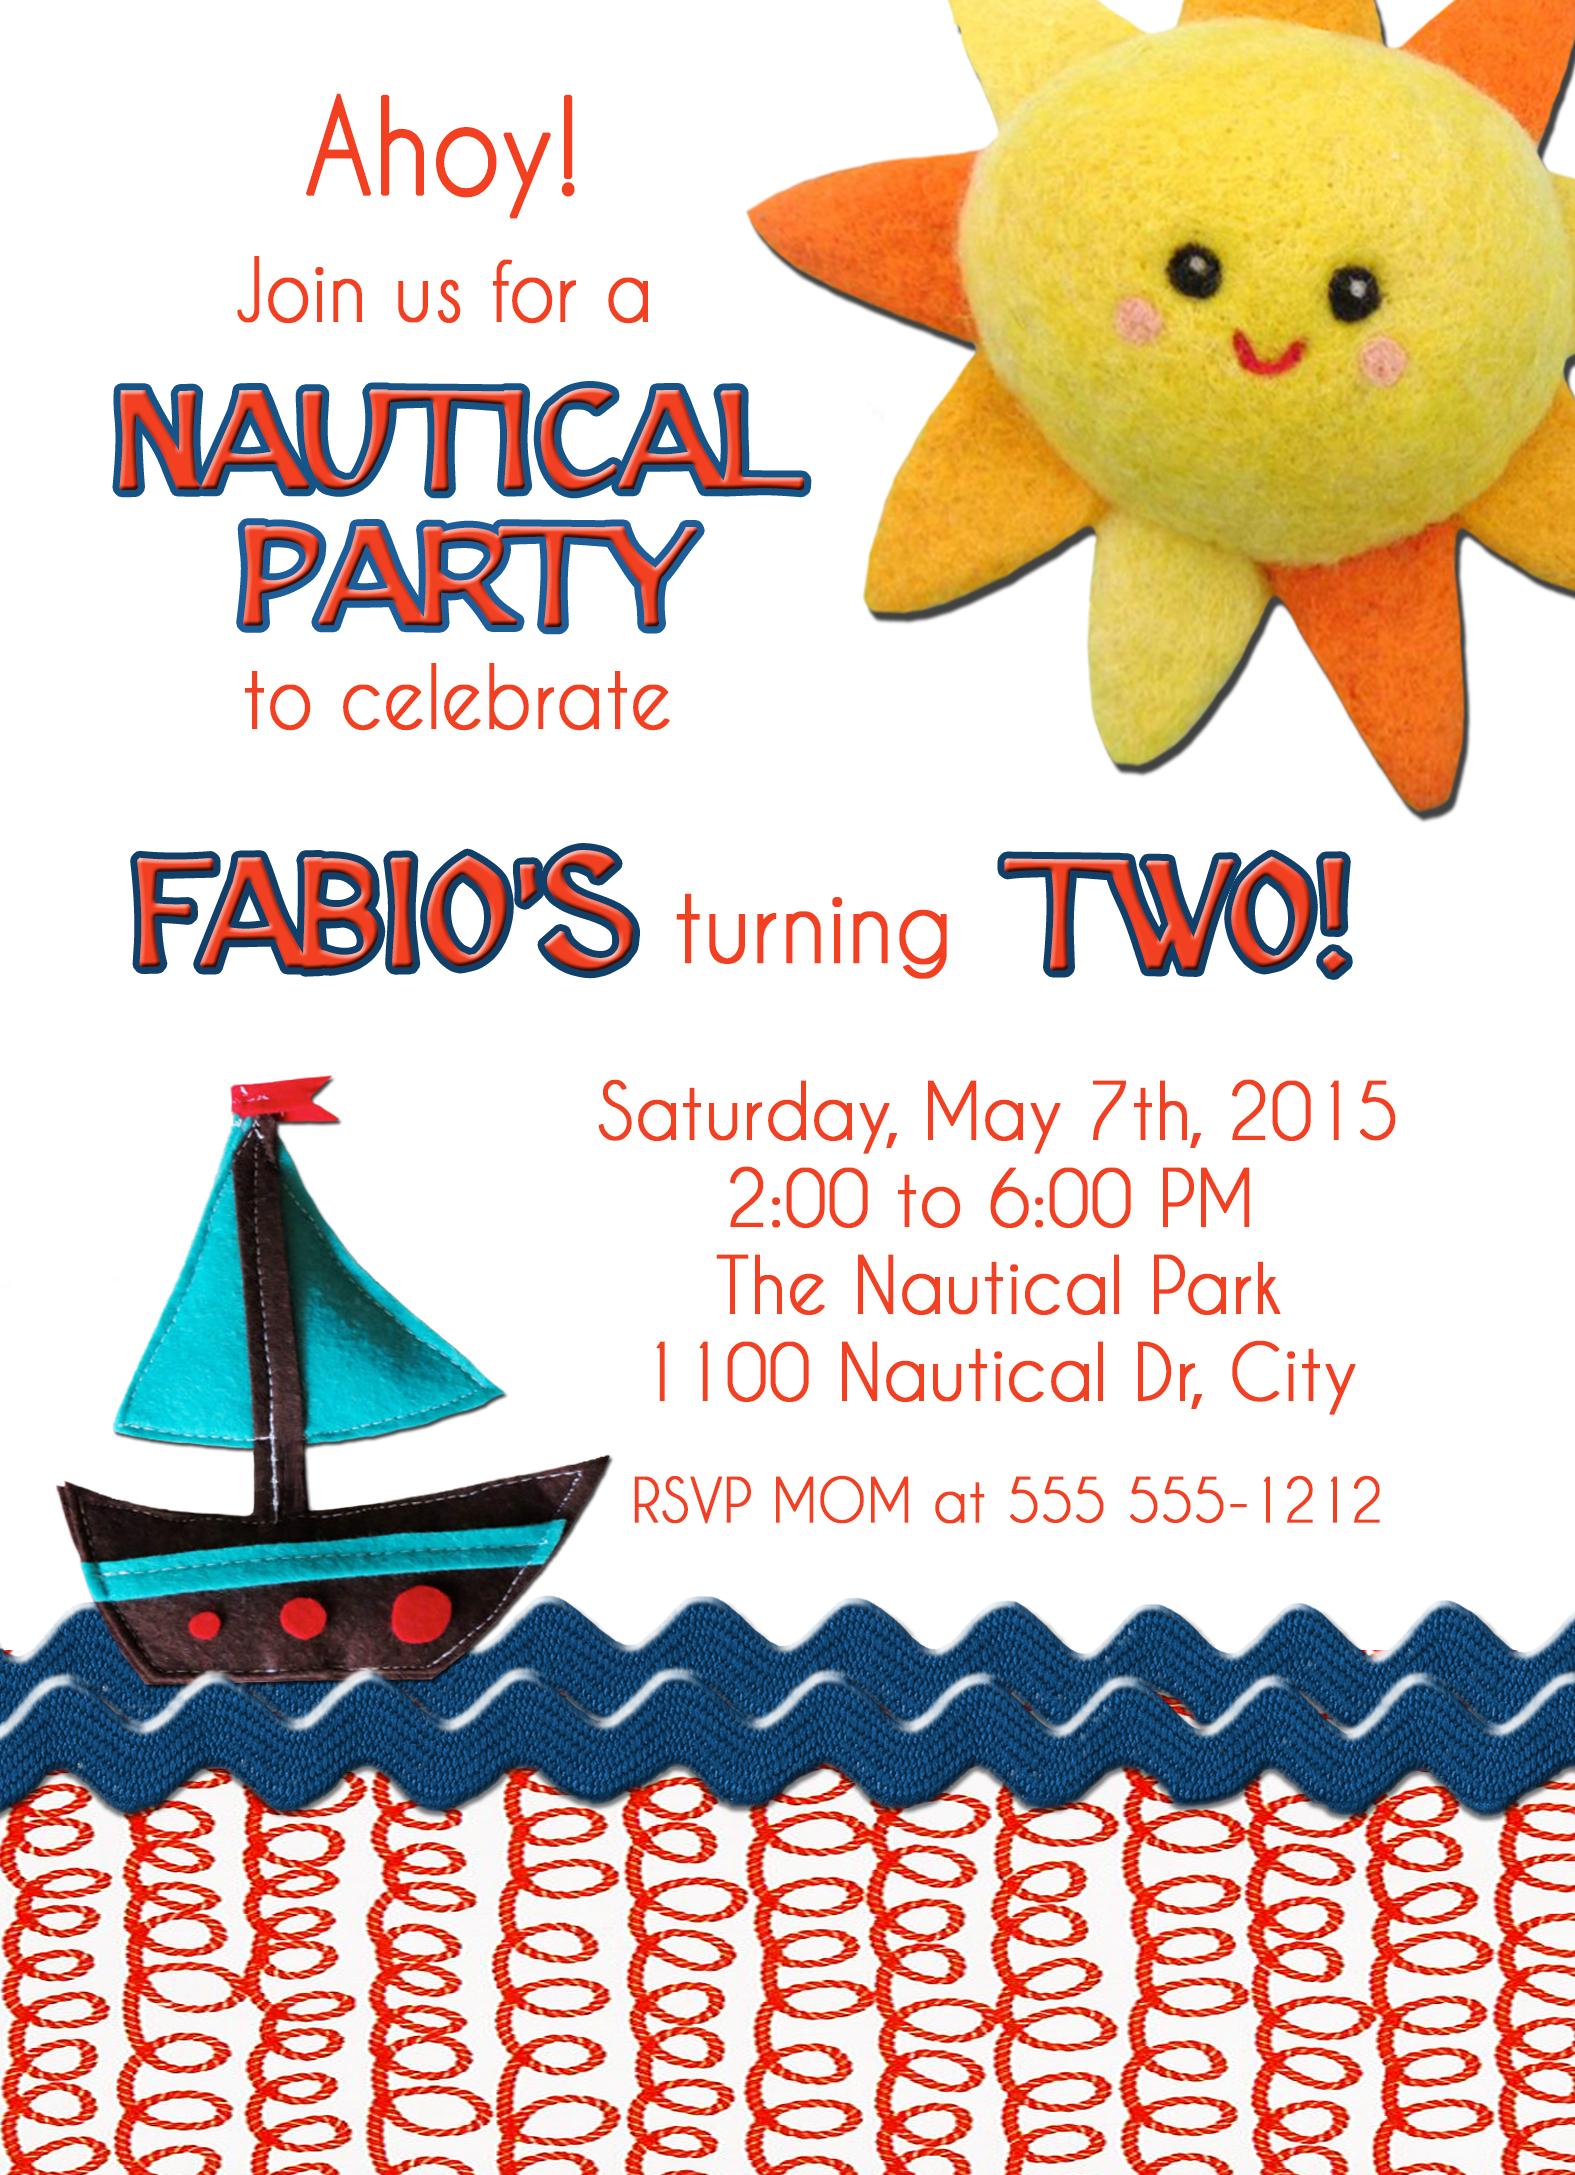 Nautical Birthday Invitation 1 Sided, Birthday Card, Party ...